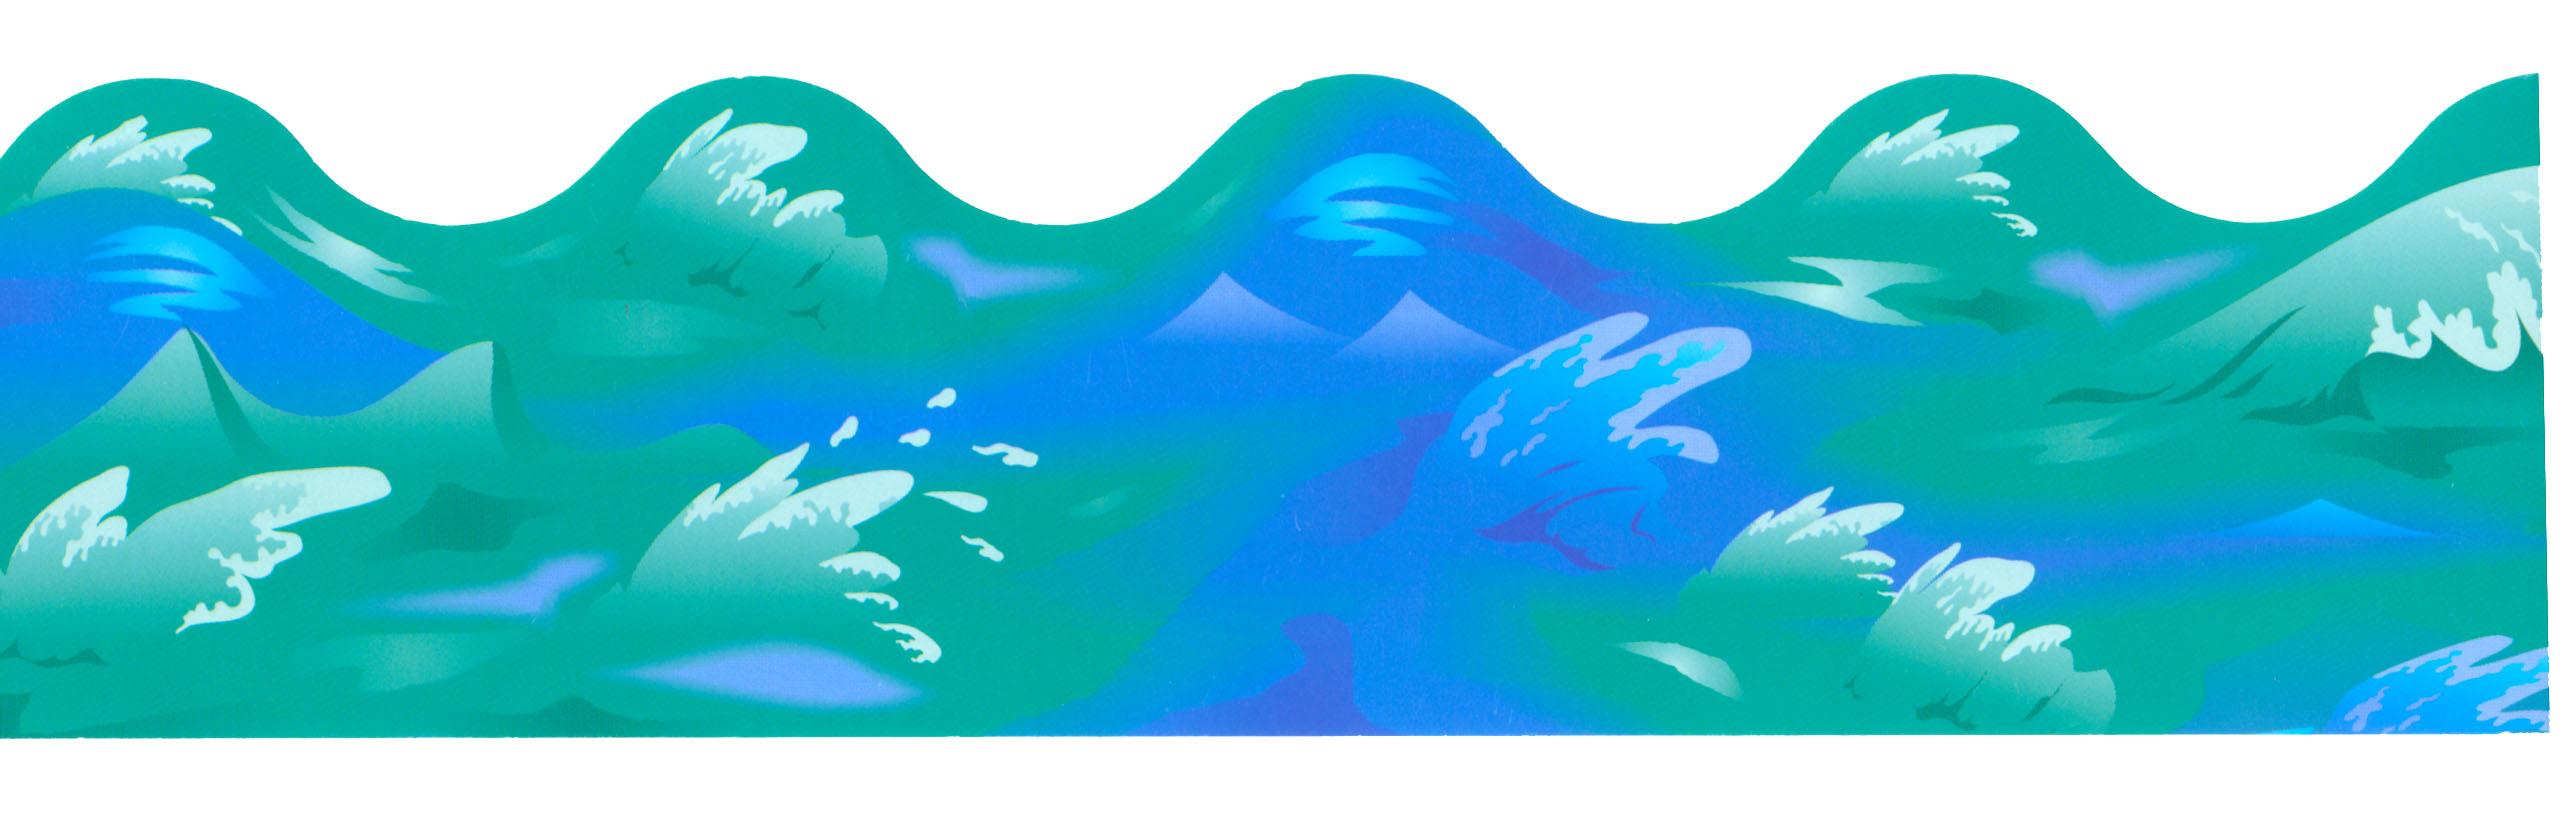 Ocean Waves Border - Clipart Library-Ocean Waves Border - Clipart library-2